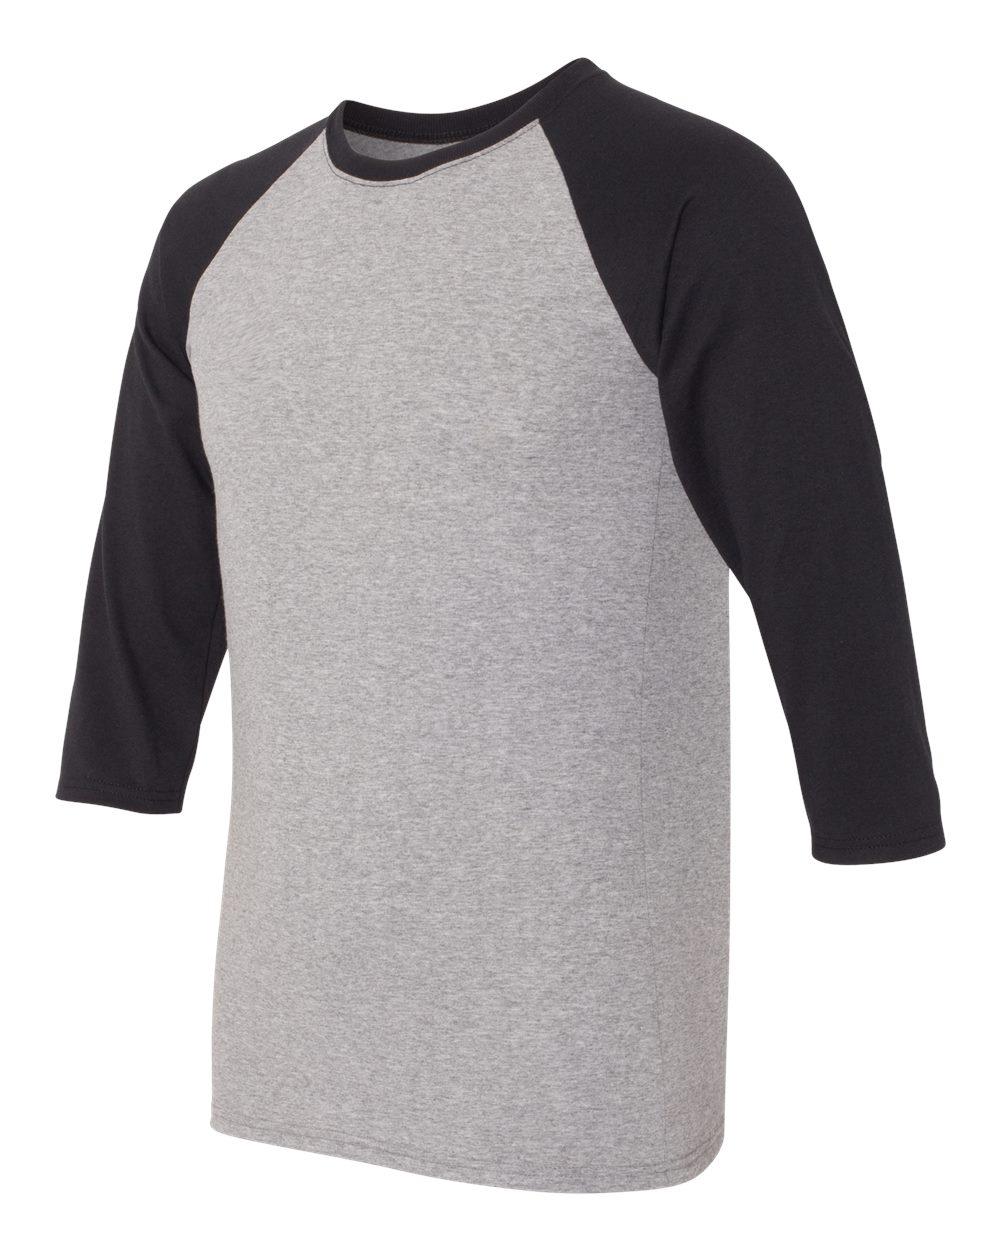 Jerzees 601RR - Dri-Power Active Triblend Baseball Raglan T-Shirt